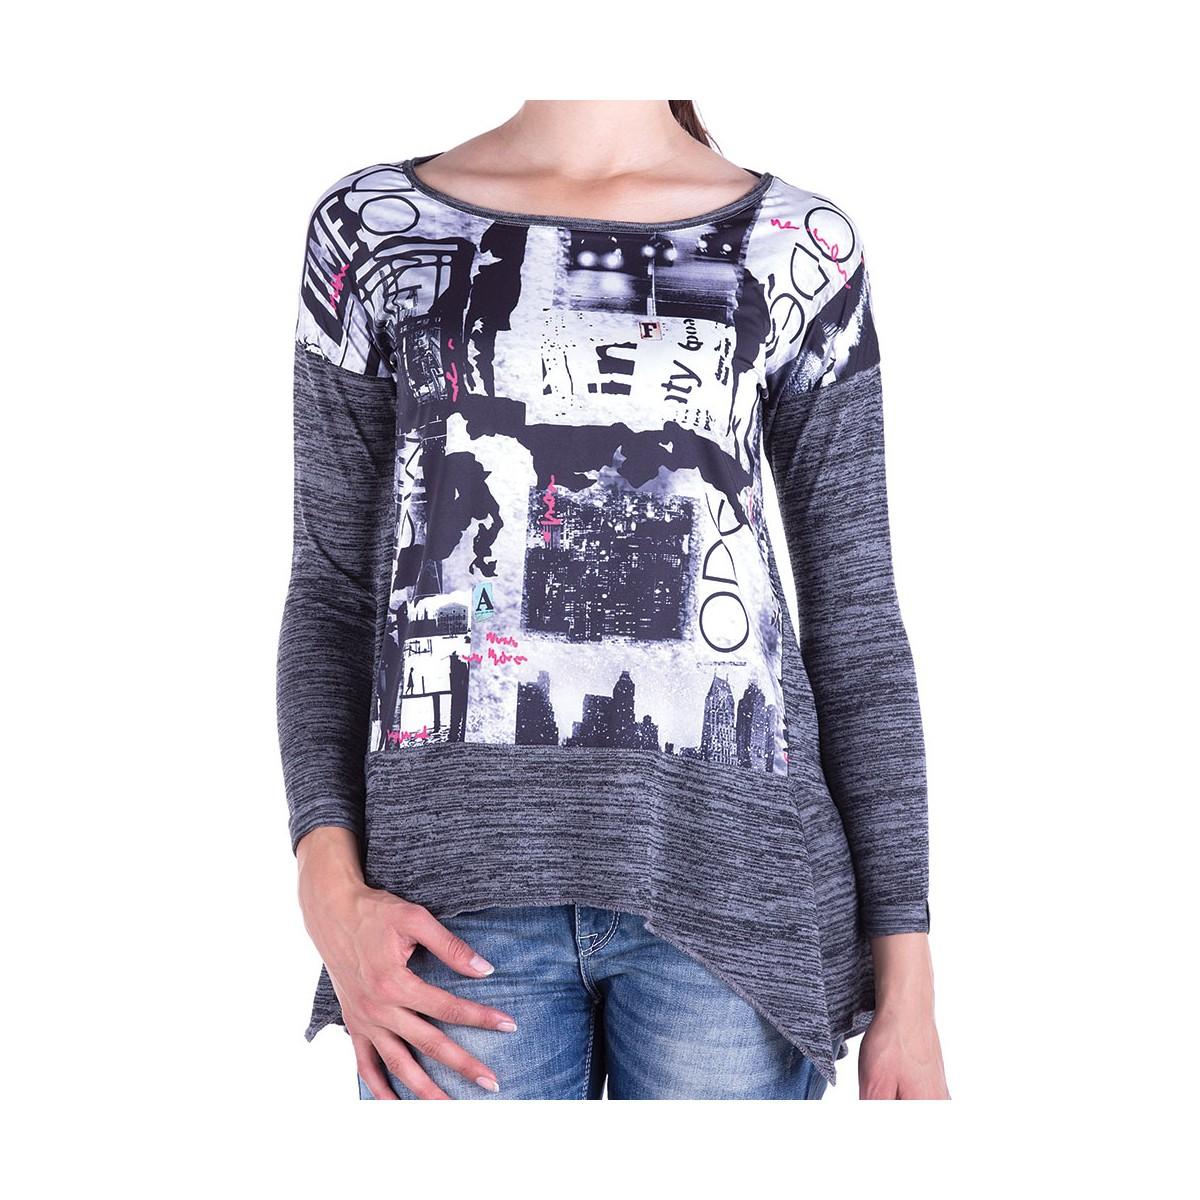 Cipo & Baxx Damen Street Mode SweatT-Shirt Pullover Sweater lli LongsLeeve Langarm grau